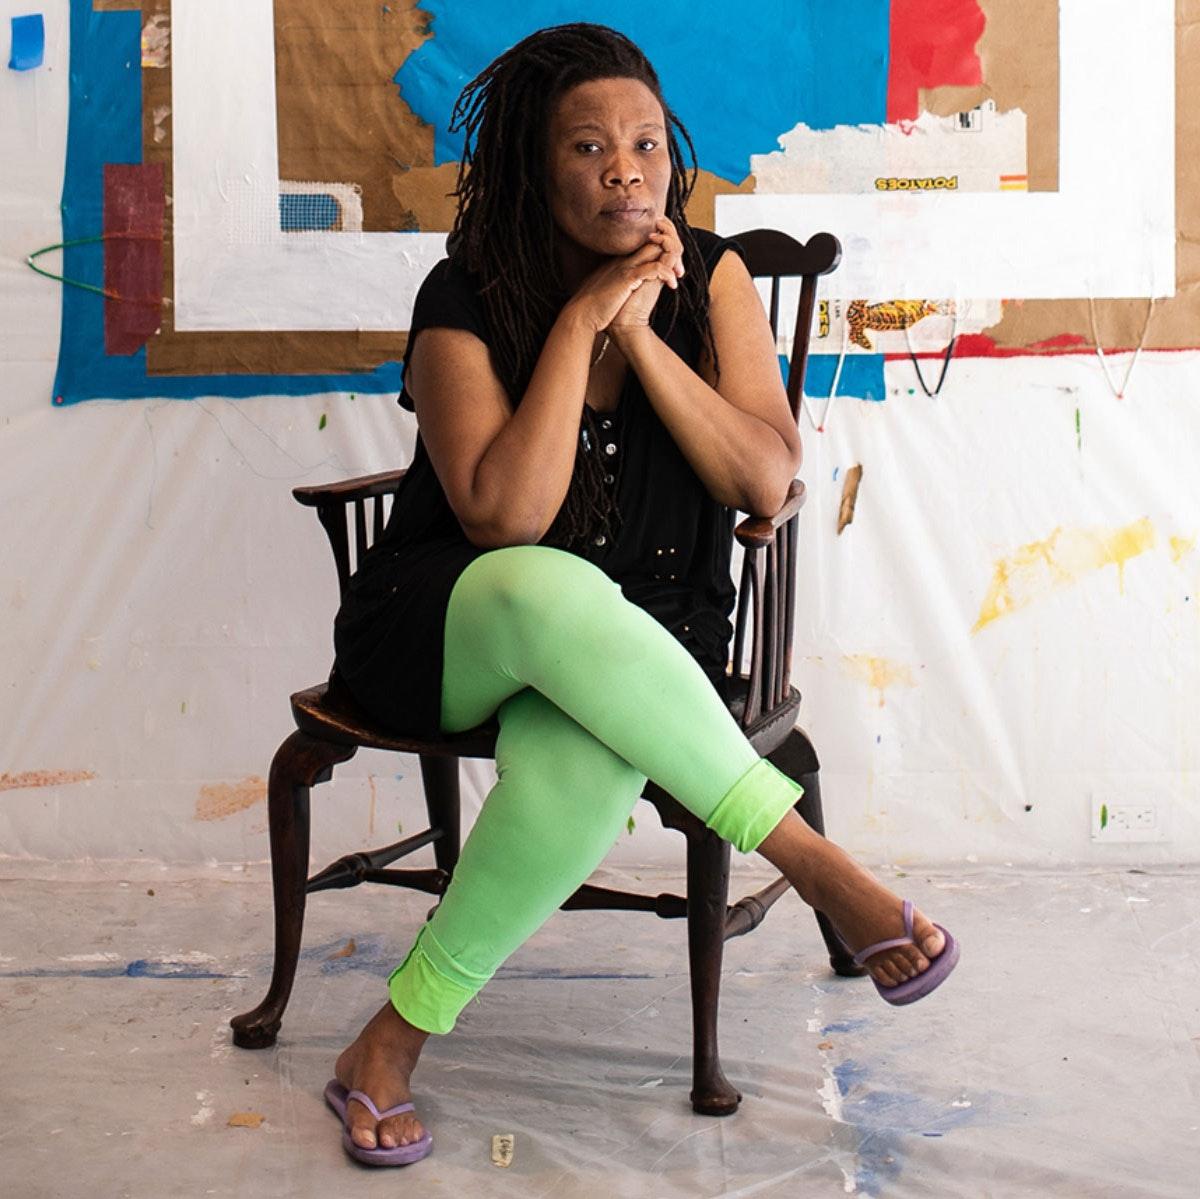 Image of Tomashi Jackson in her studio